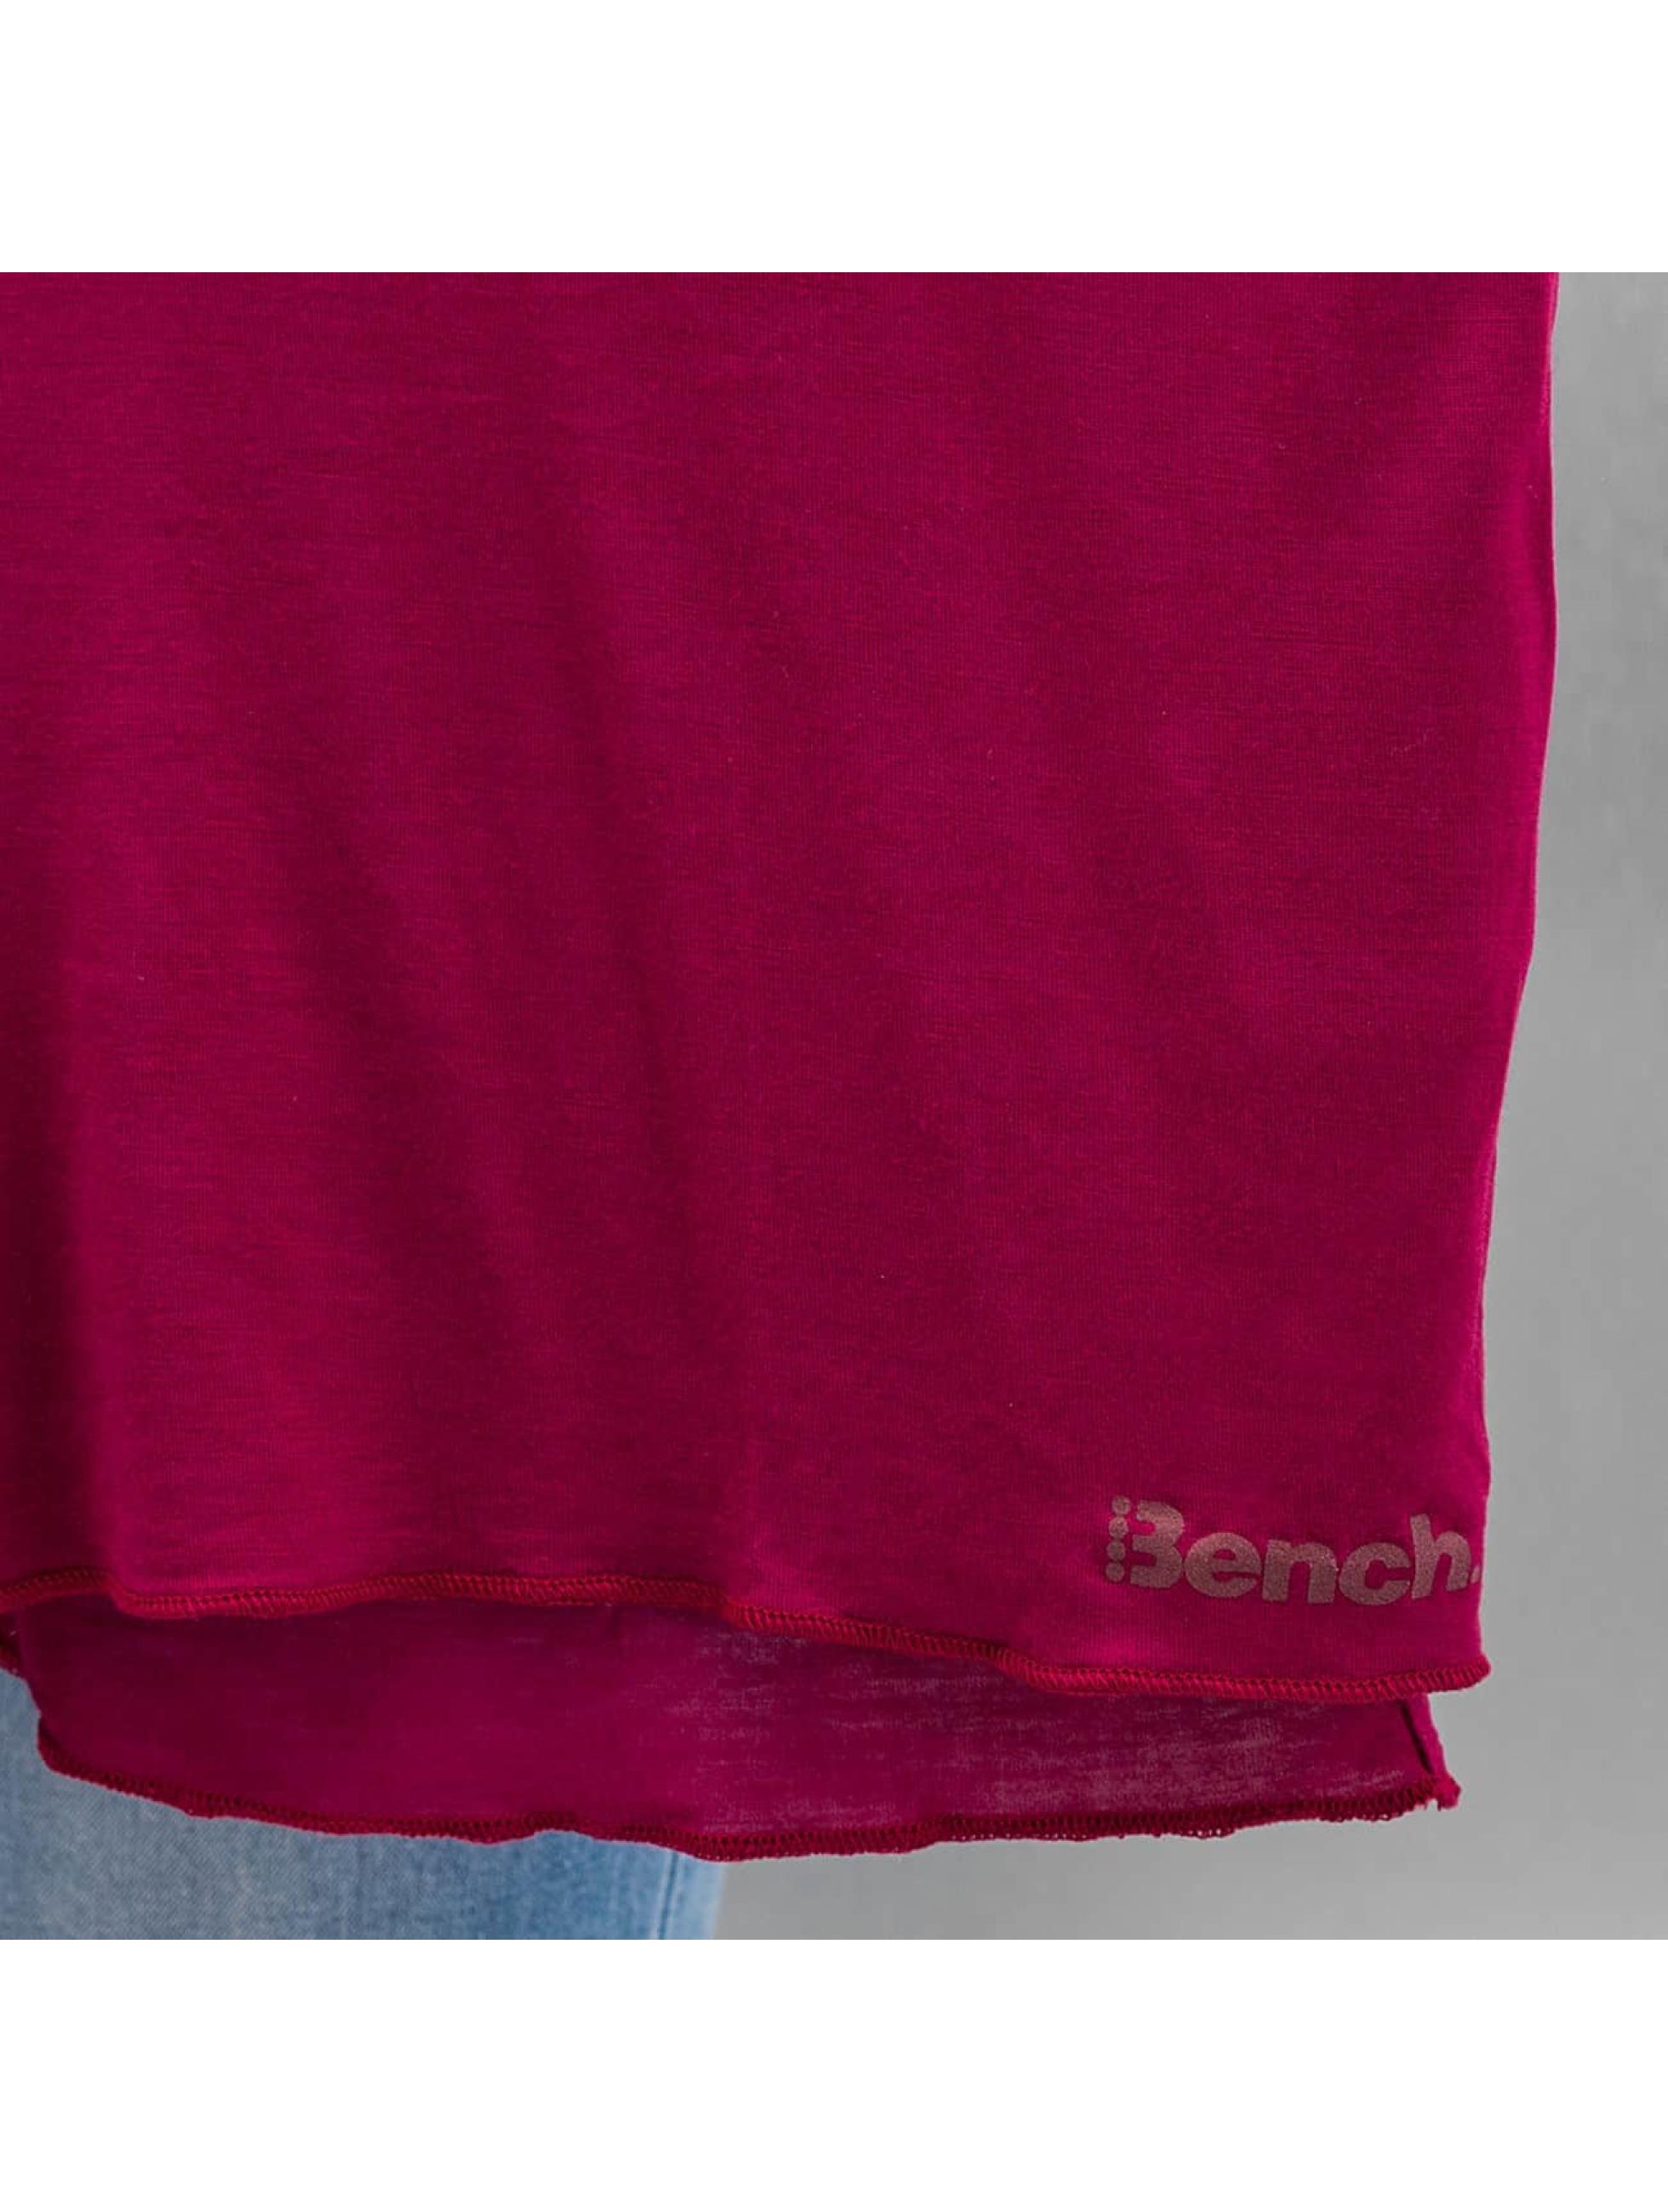 Bench Pitkähihaiset paidat Performance Addendum Oversize punainen